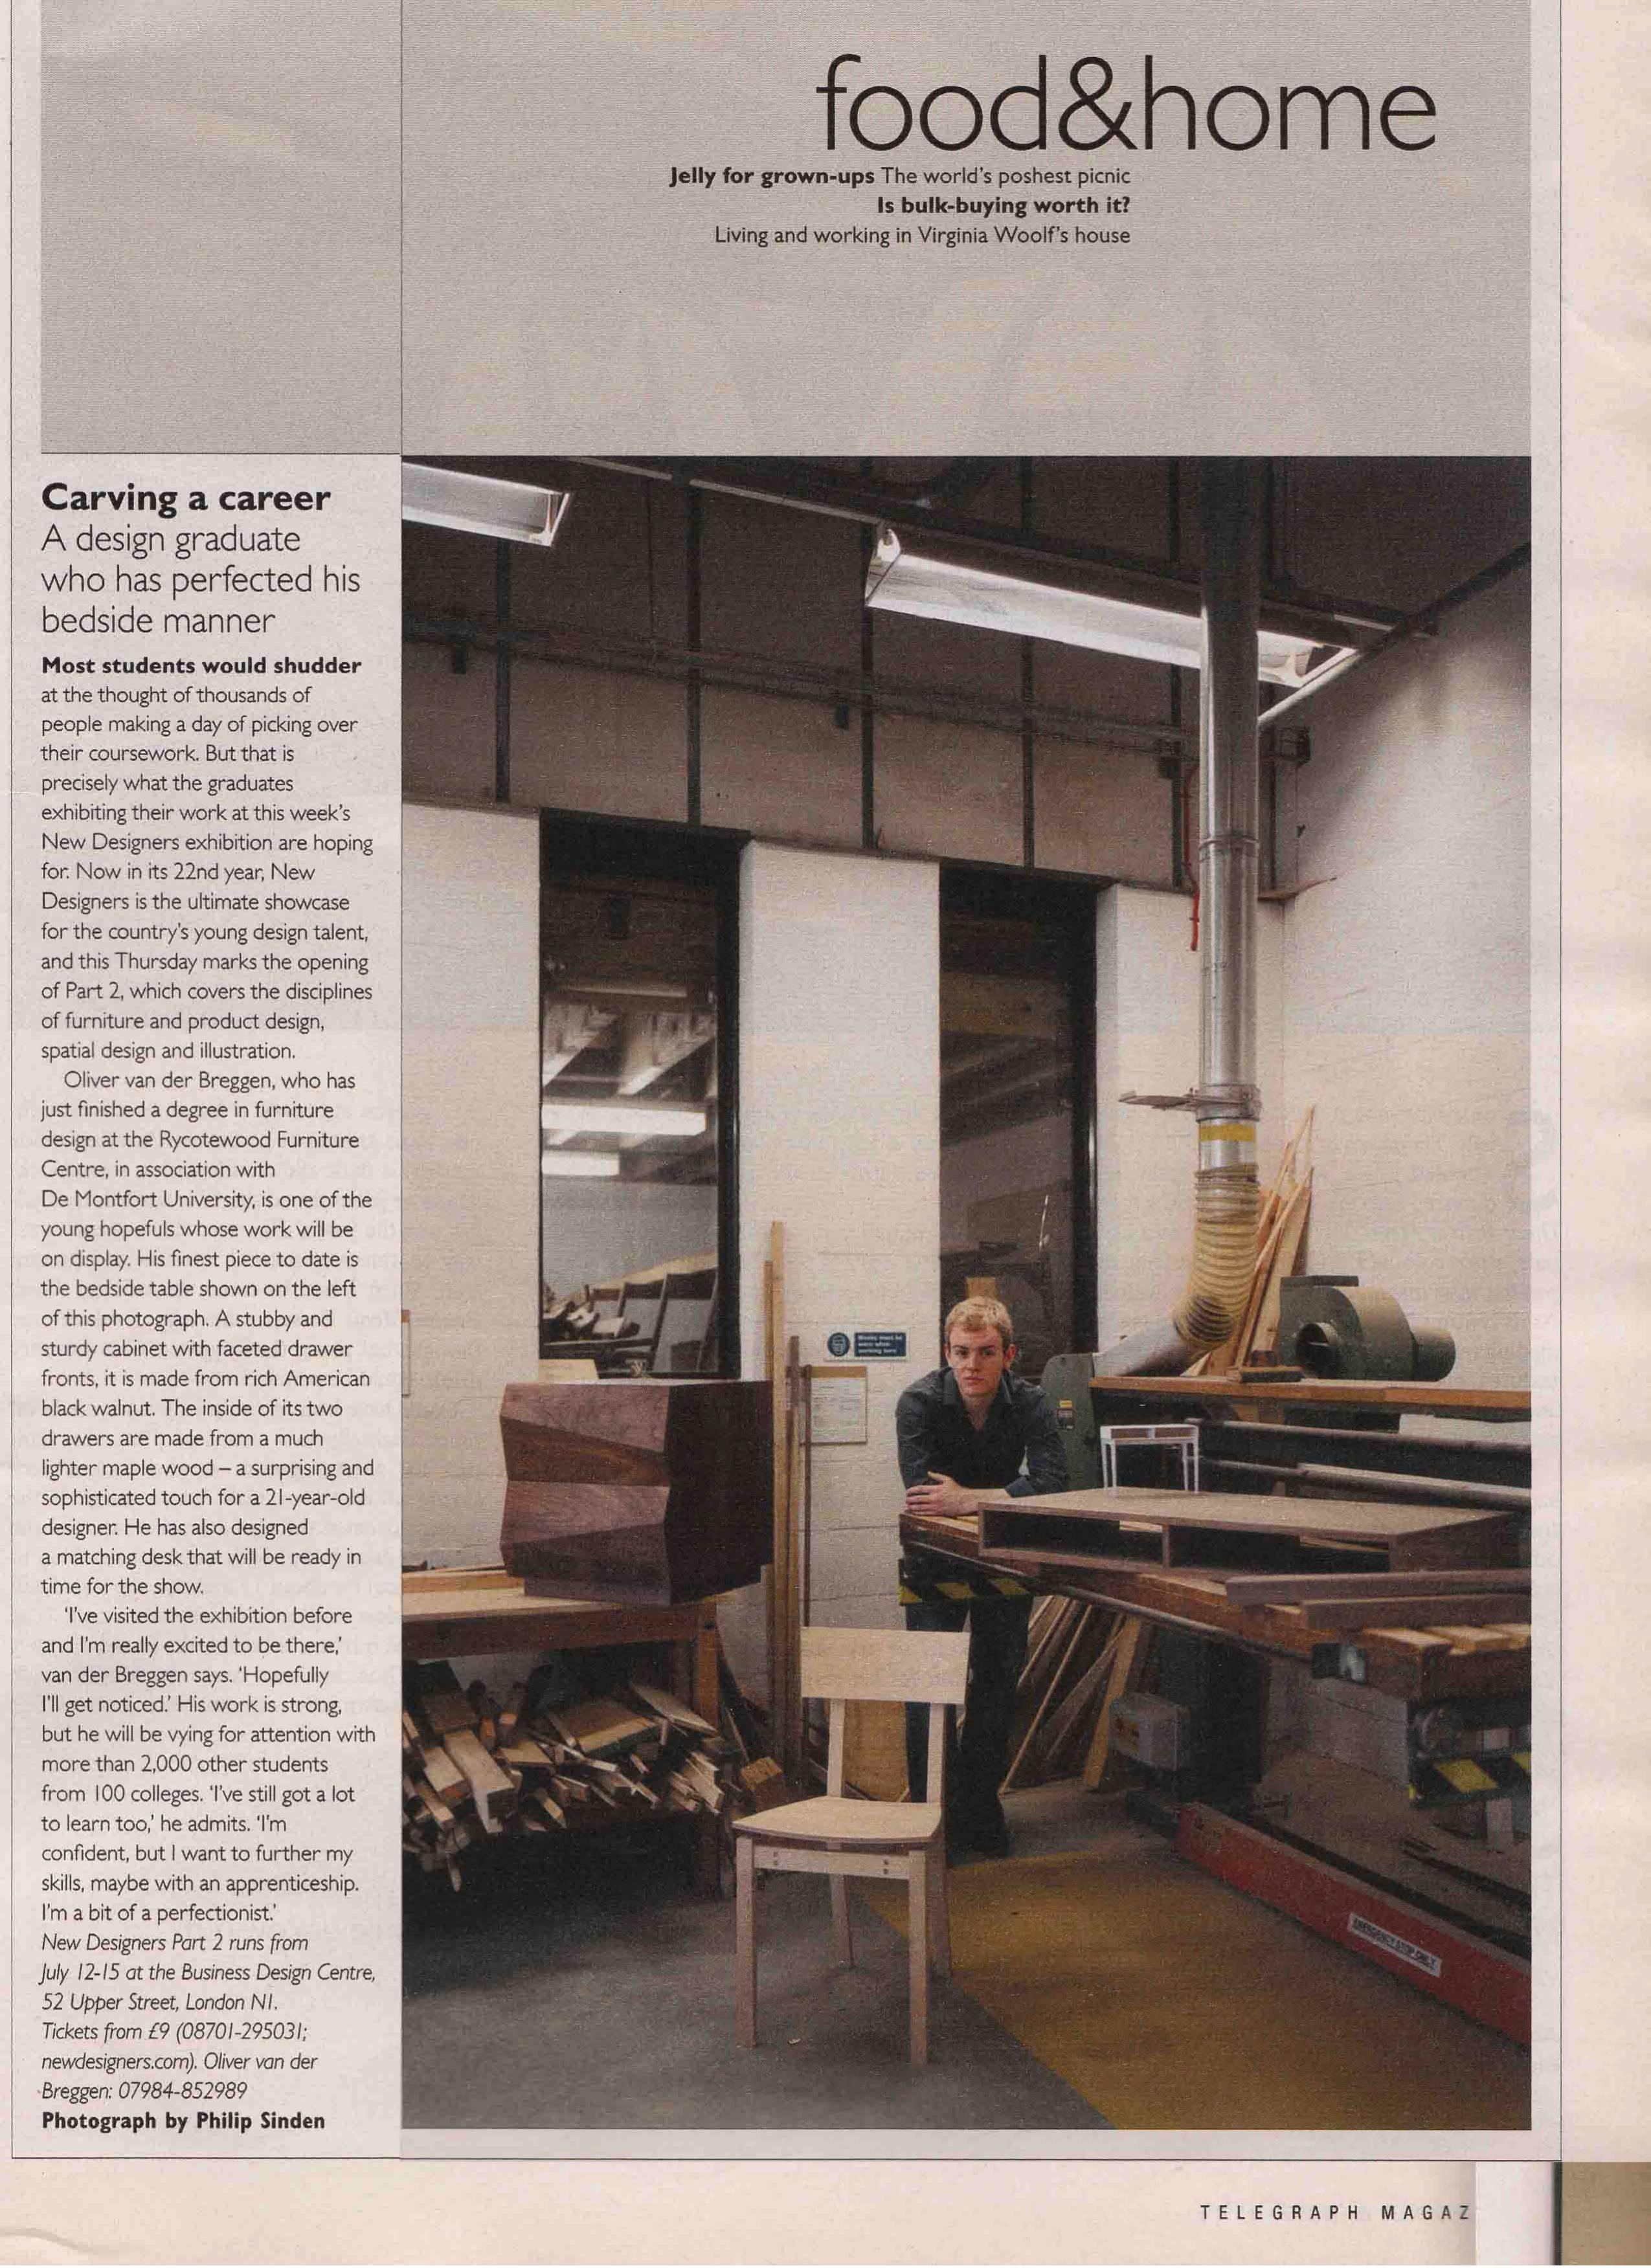 U0027British Makers Of The Futureu0027 New Designers, Furniture U0026 Cabinetmaking  Magazine   October 2007   Readersu0027 Gallery, Furniture U0026 Cabinetmaking  Magazine   May ...